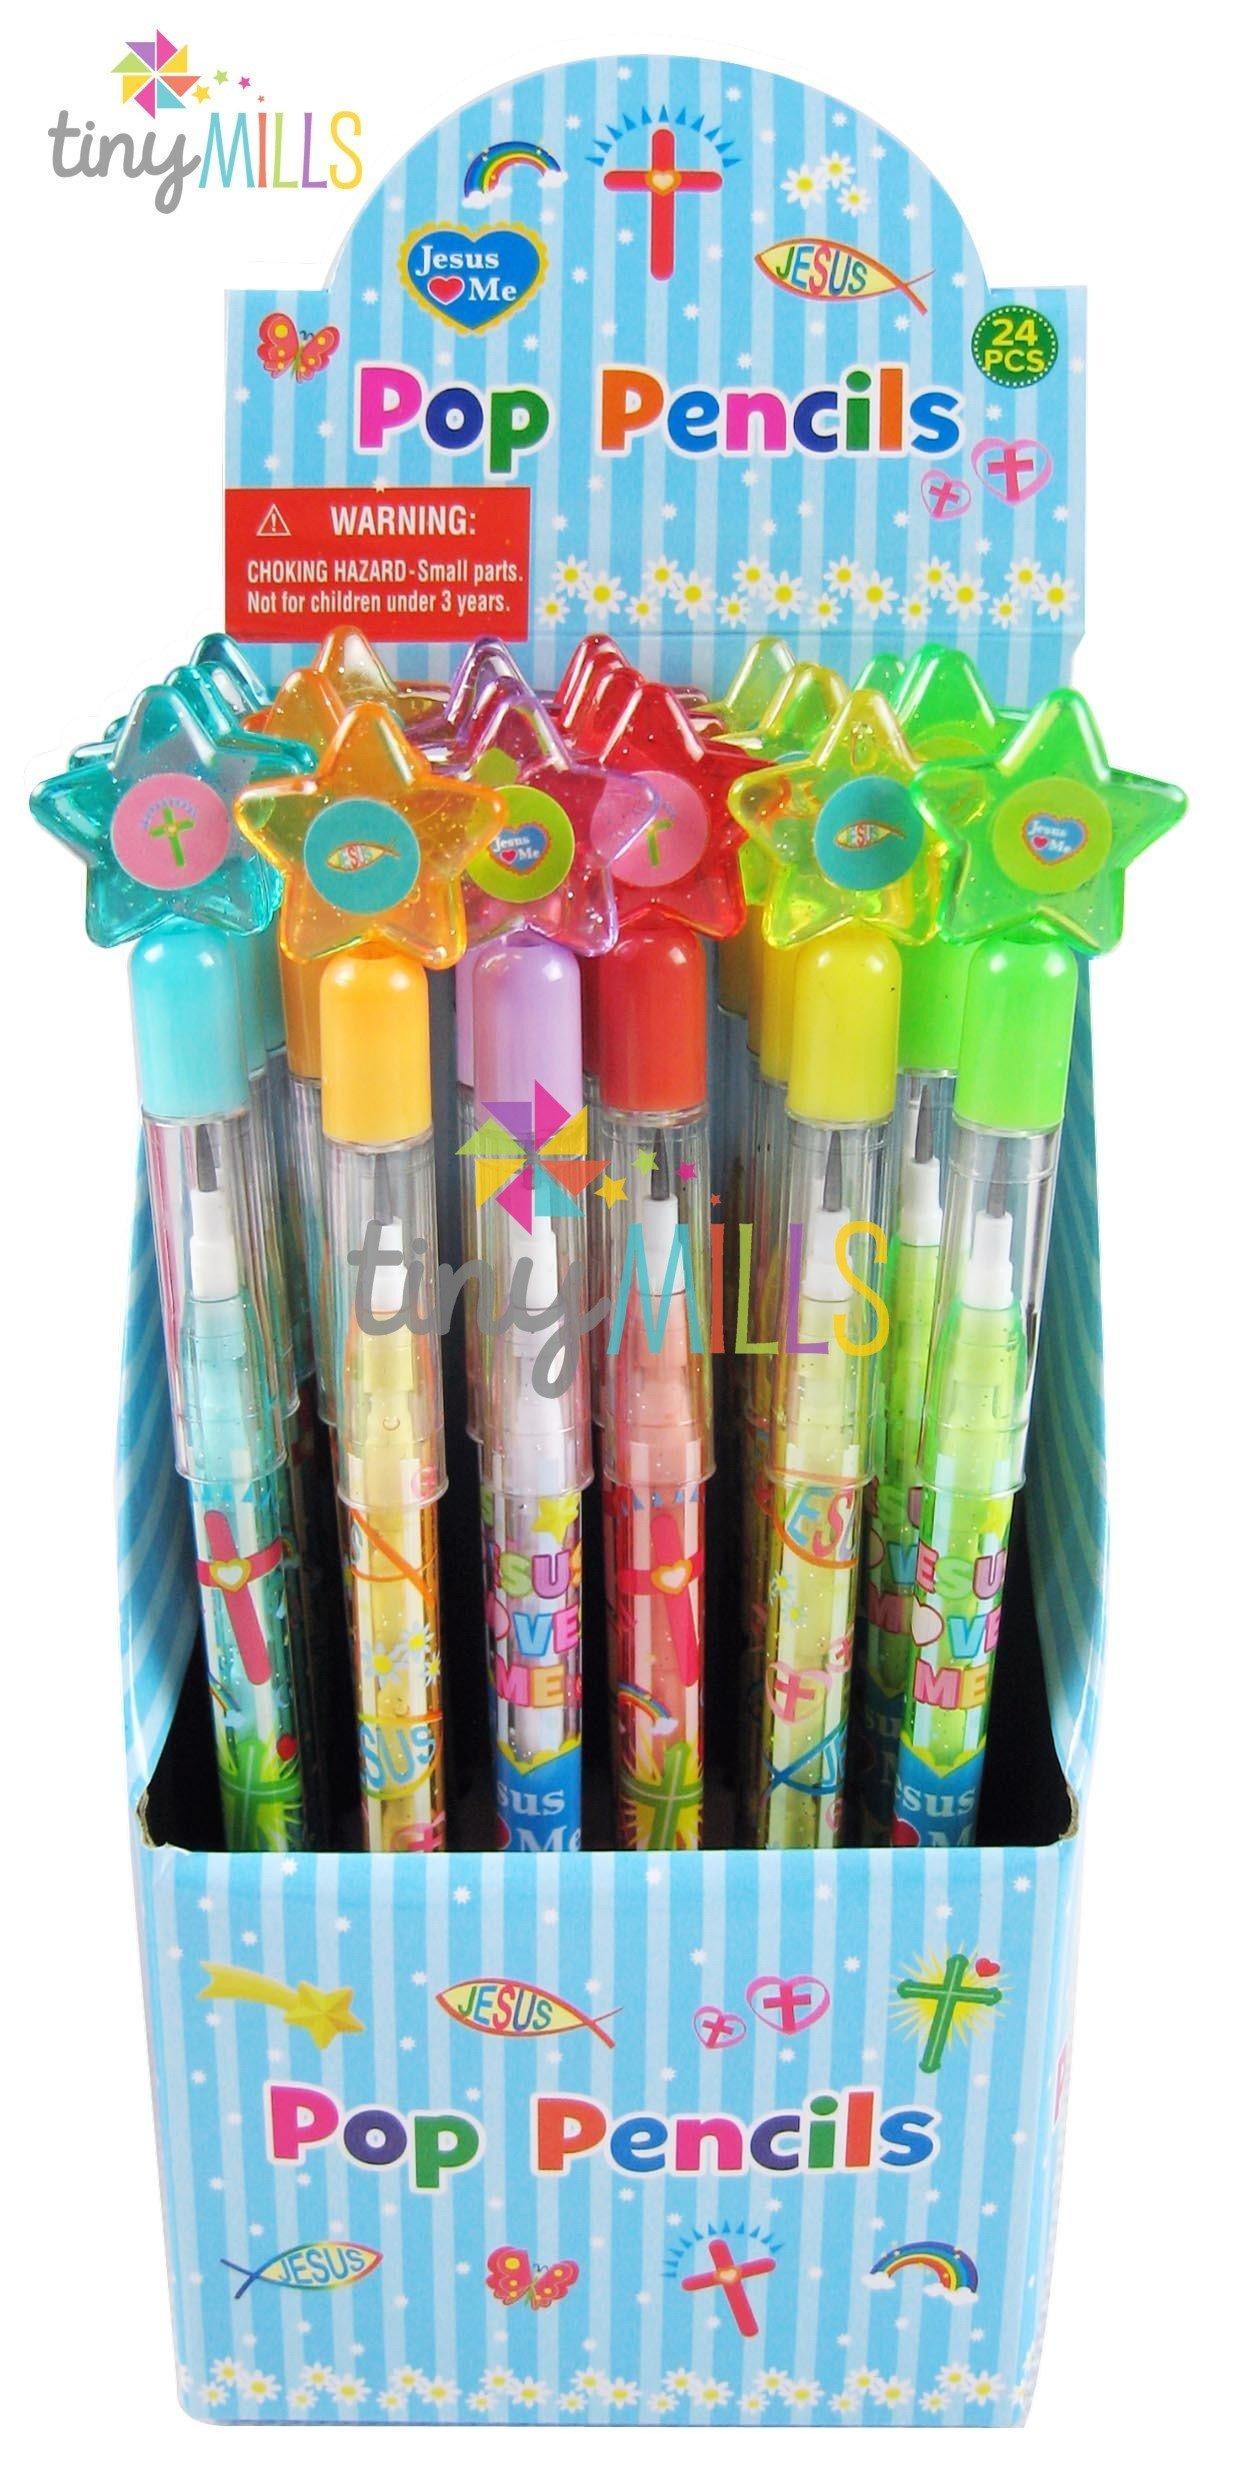 TINYMILLS 24 Pcs Religious Multi Point Pencils